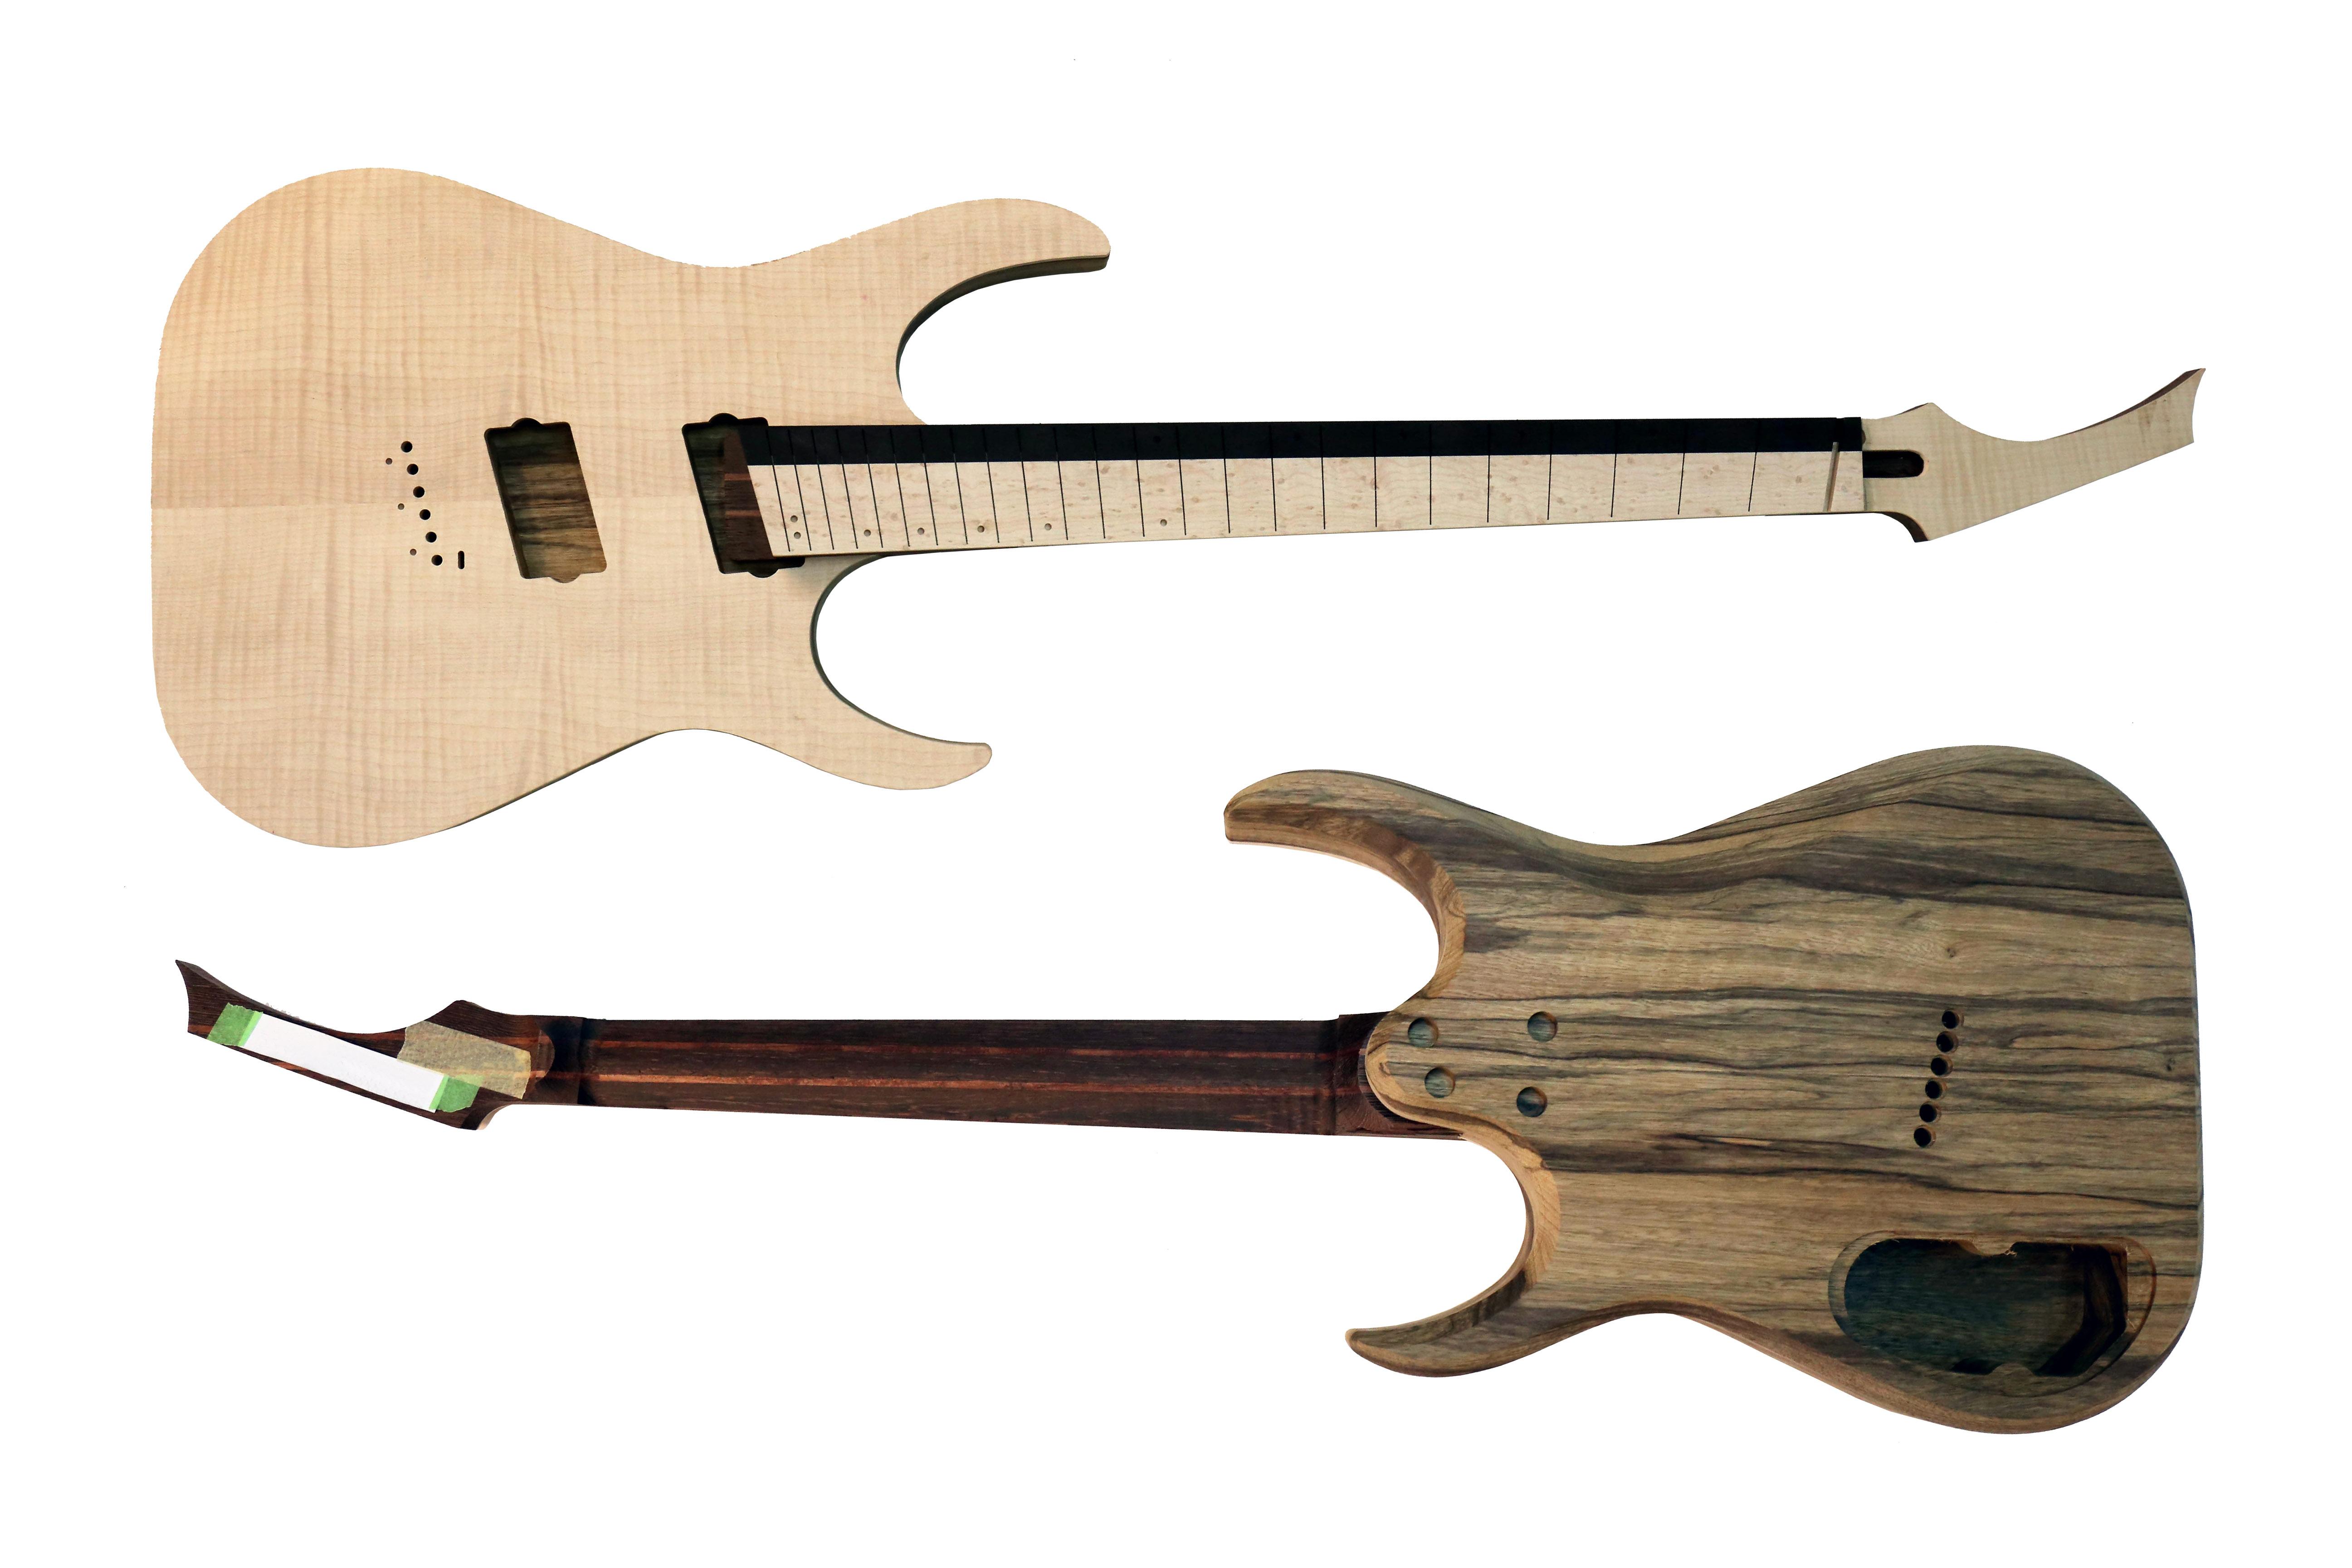 Mirage 6FF Flame Maple, 2-piece fretboard